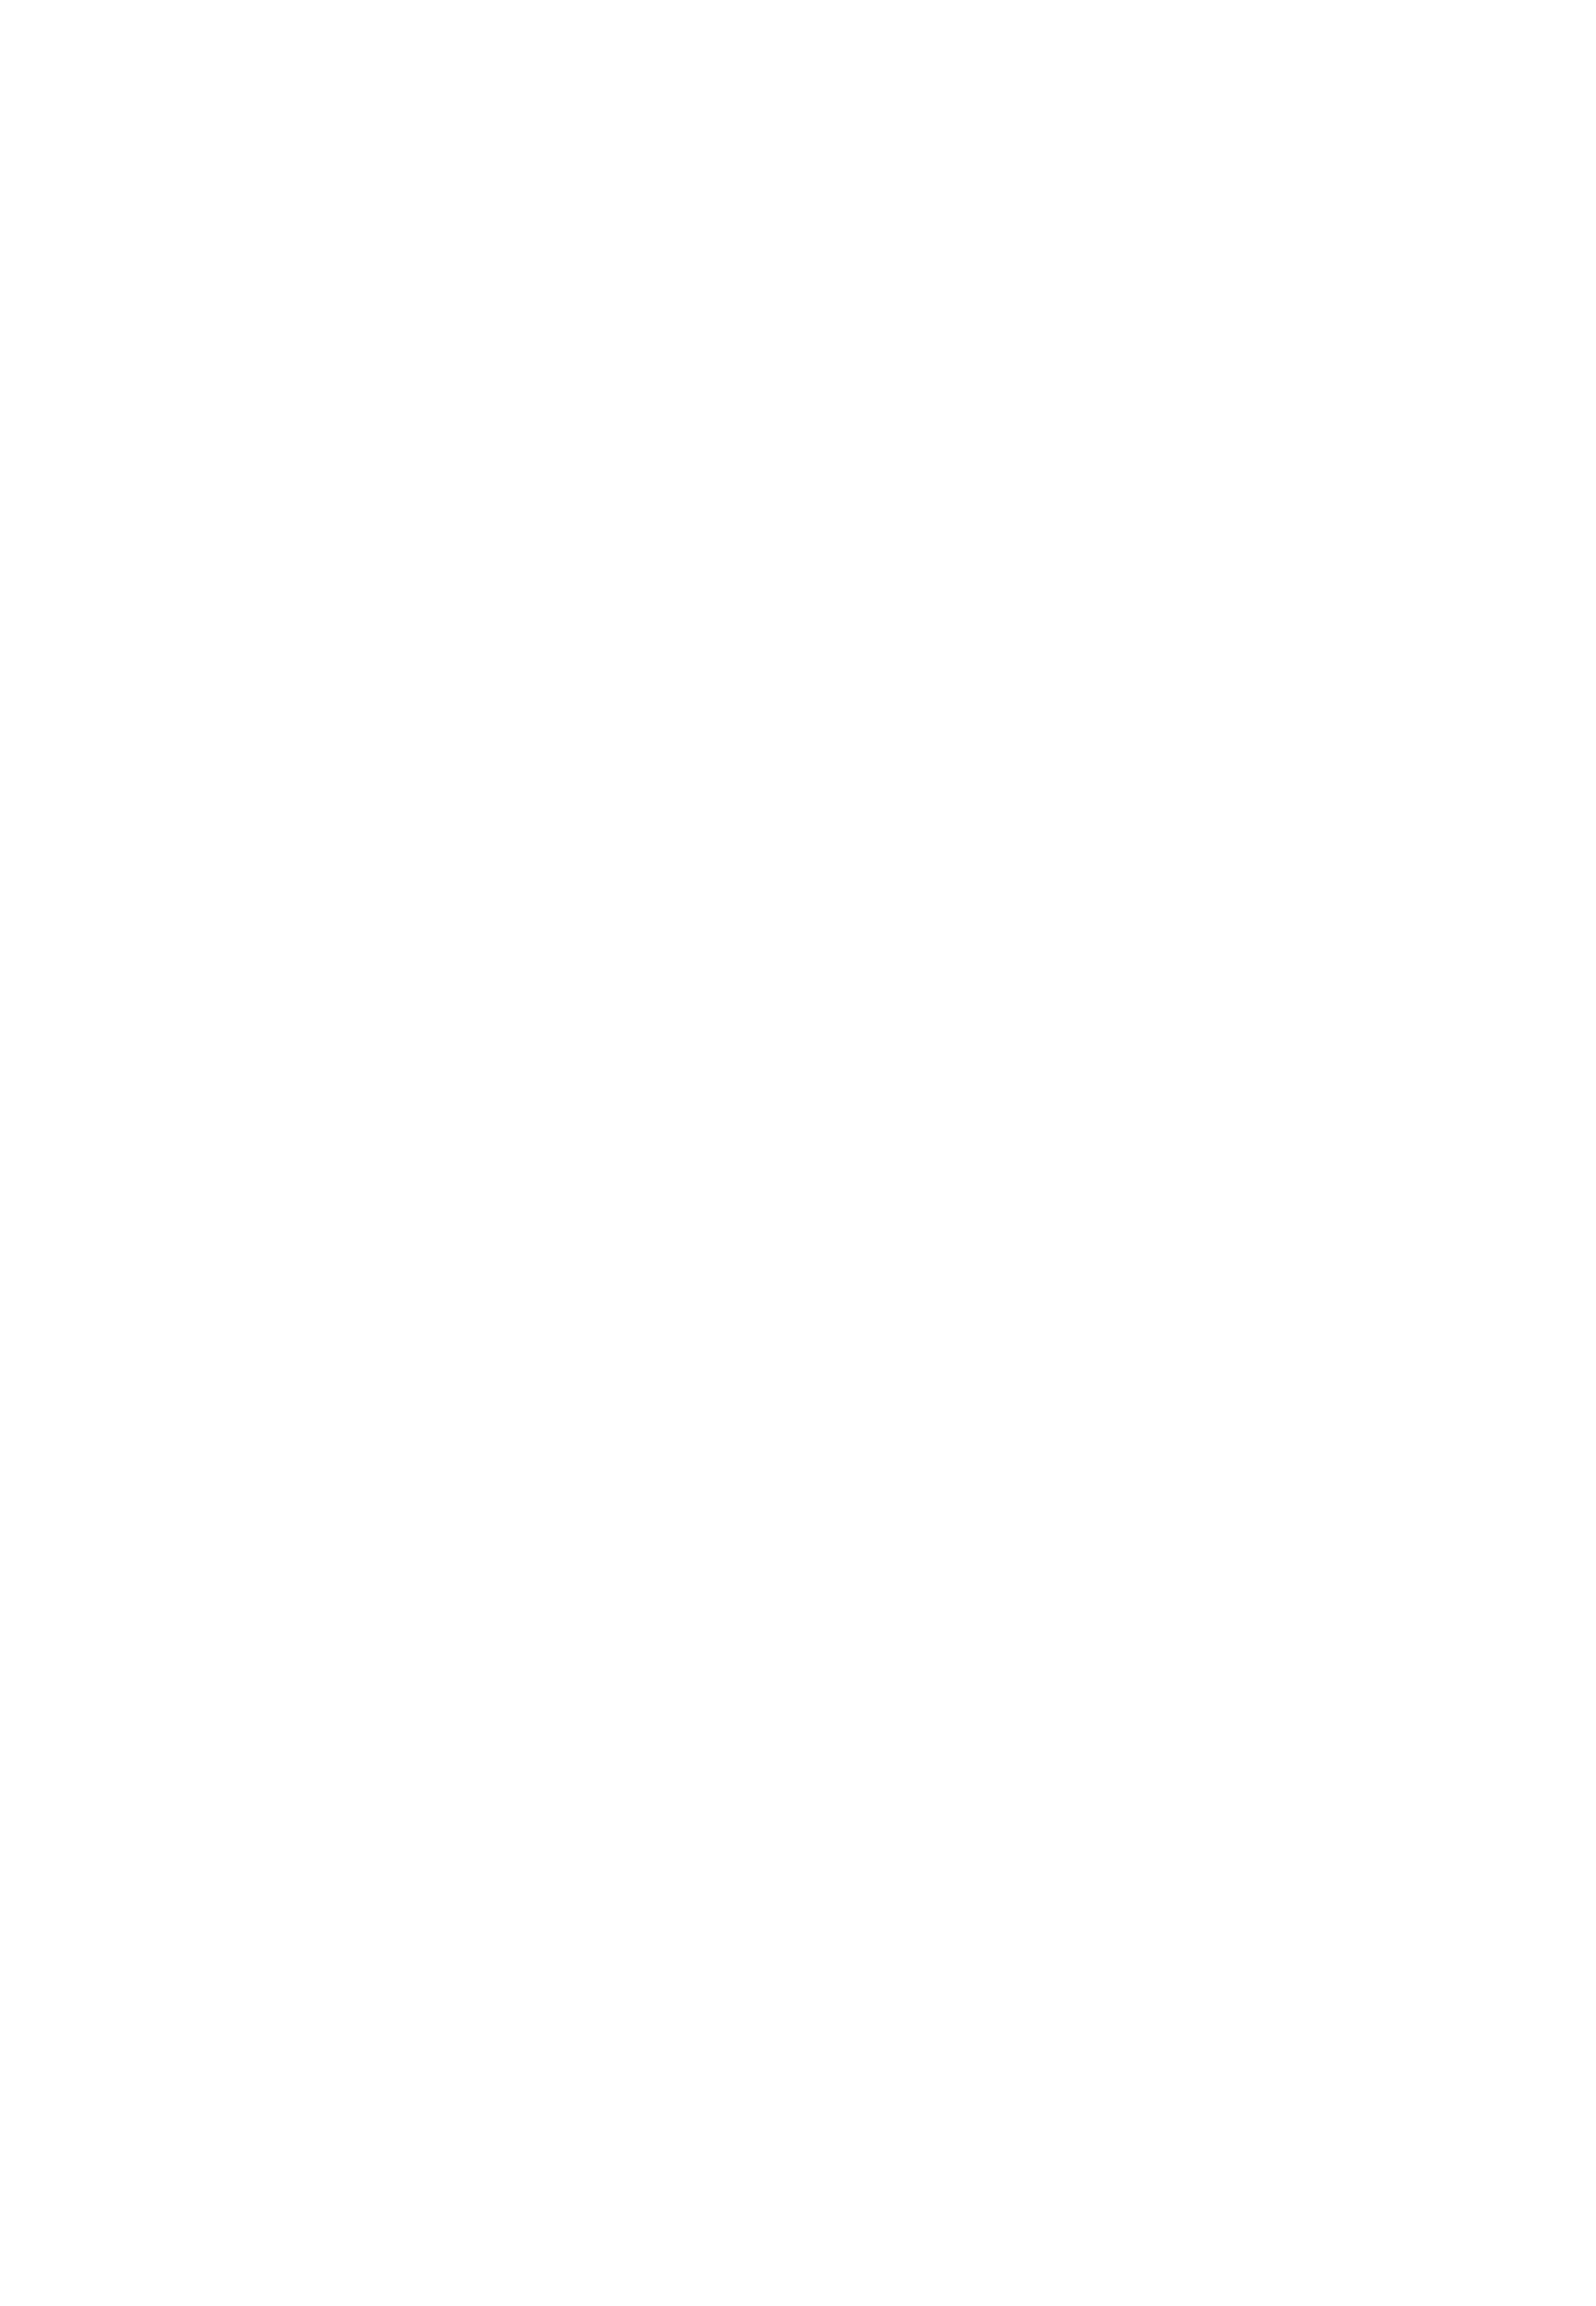 [Macxe's (monmon)] Tokubousentai Dinaranger ~Heroine Kairaku Sennou Keikaku~ Vol.01/02/03 (Renkaban) [Digital] 35